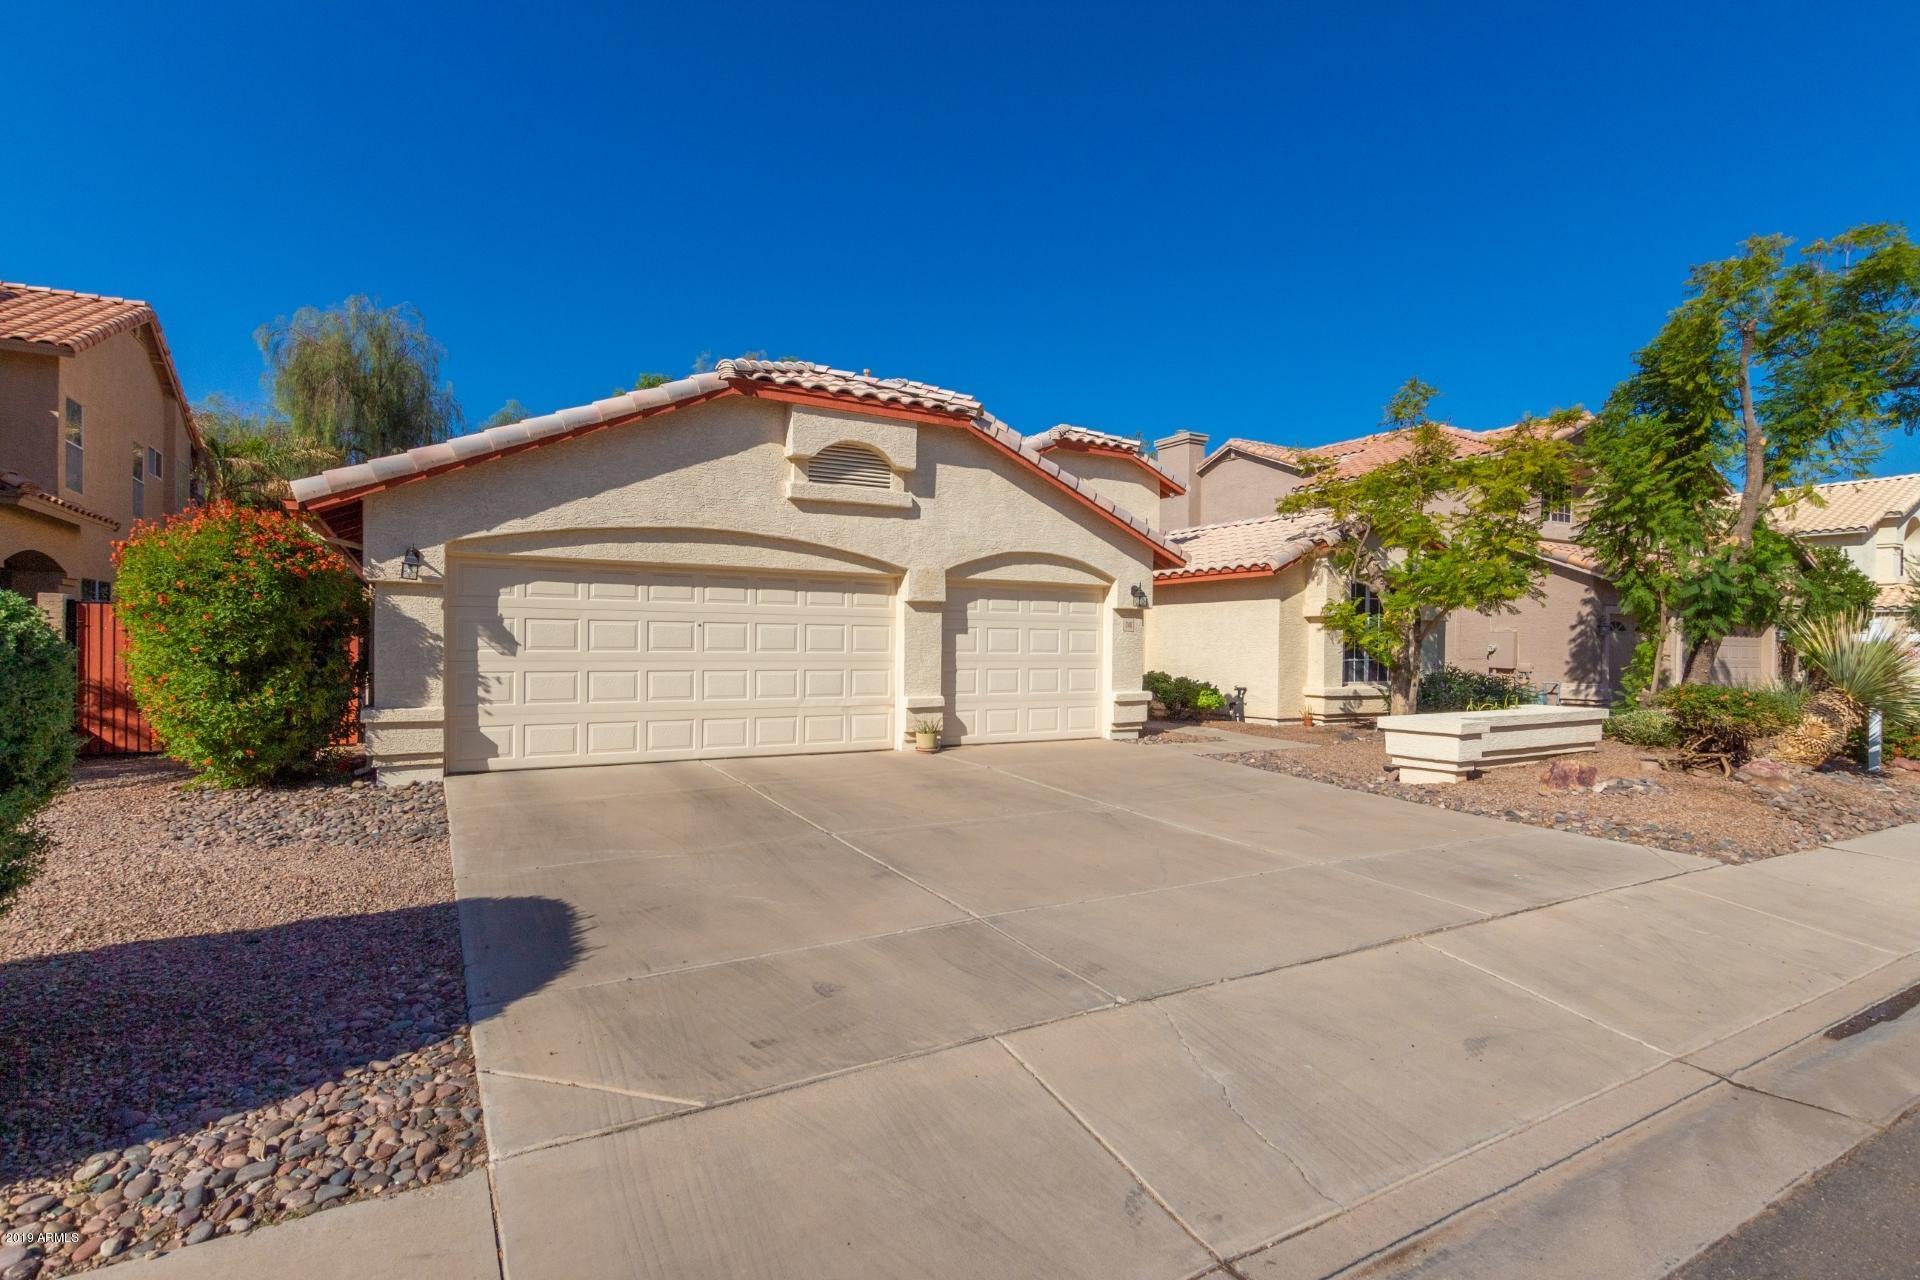 Photo of 246 S SANDSTONE Street, Gilbert, AZ 85296